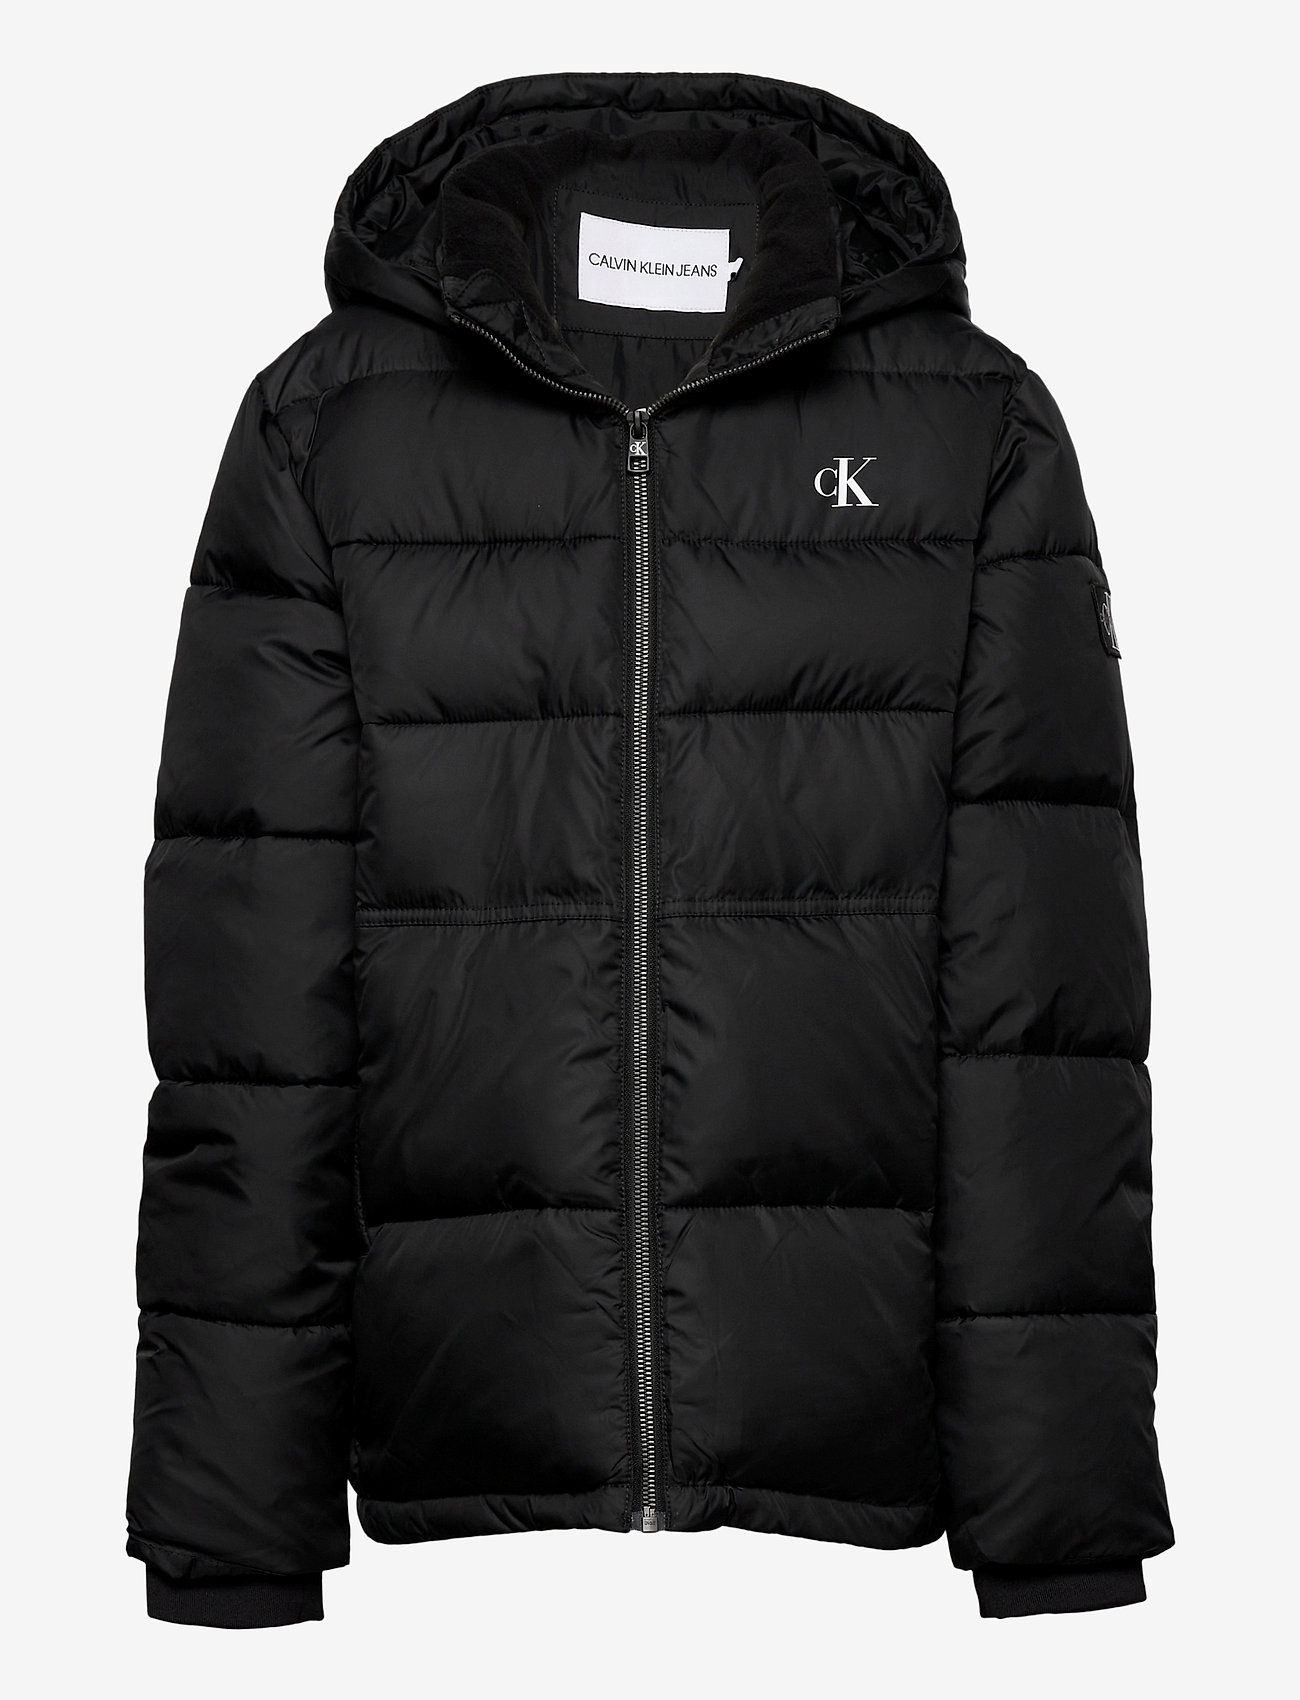 Calvin Klein - ESSENTIAL PUFFER JACKET - dunjakker & forede jakker - ck black - 0